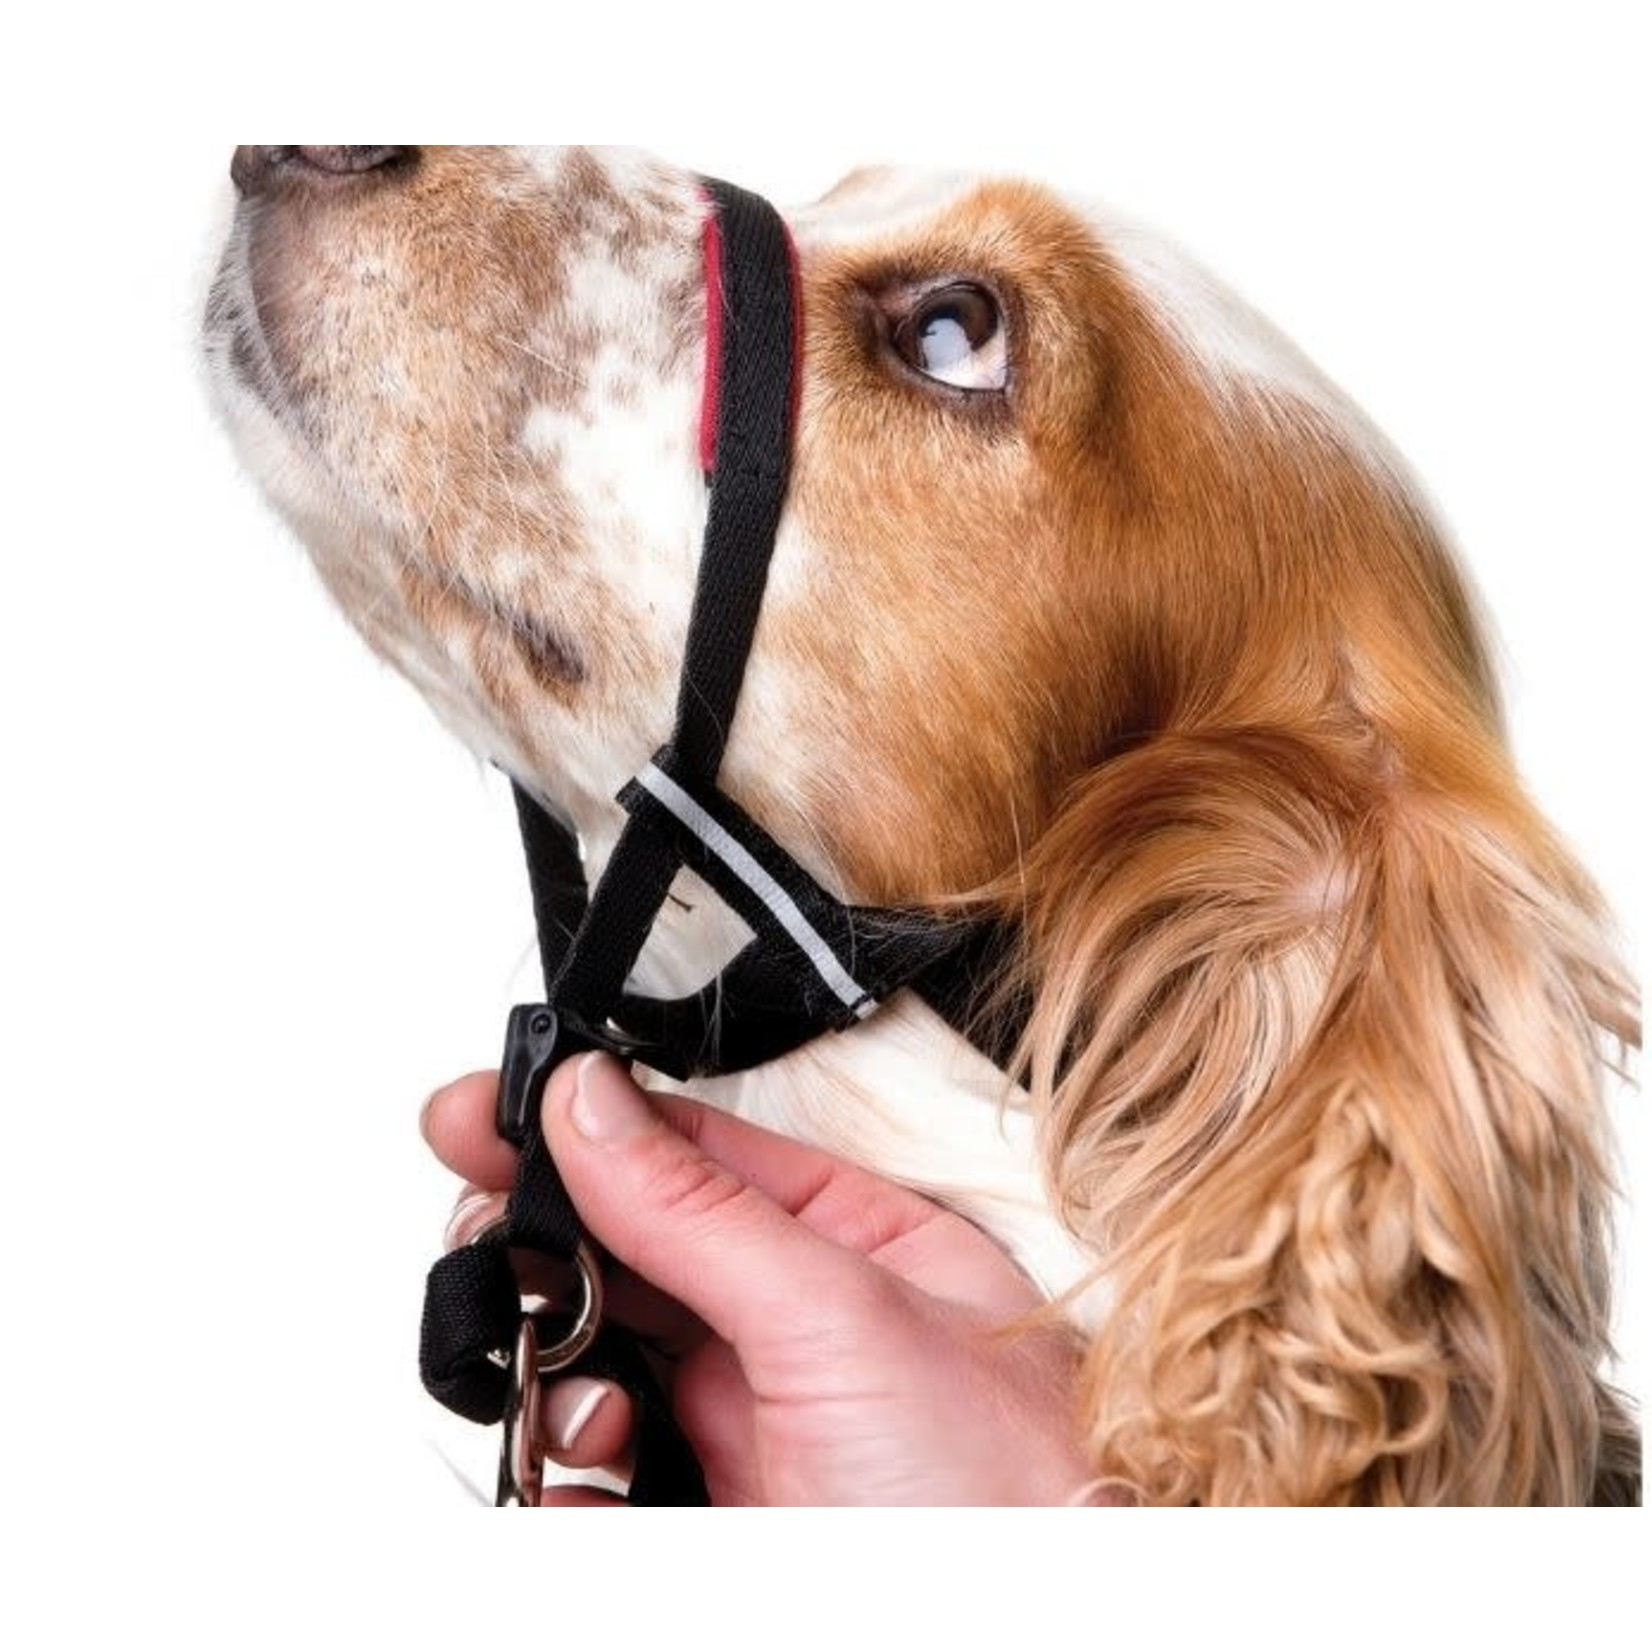 Company of Animals Halti Dog Optifit Headcollar